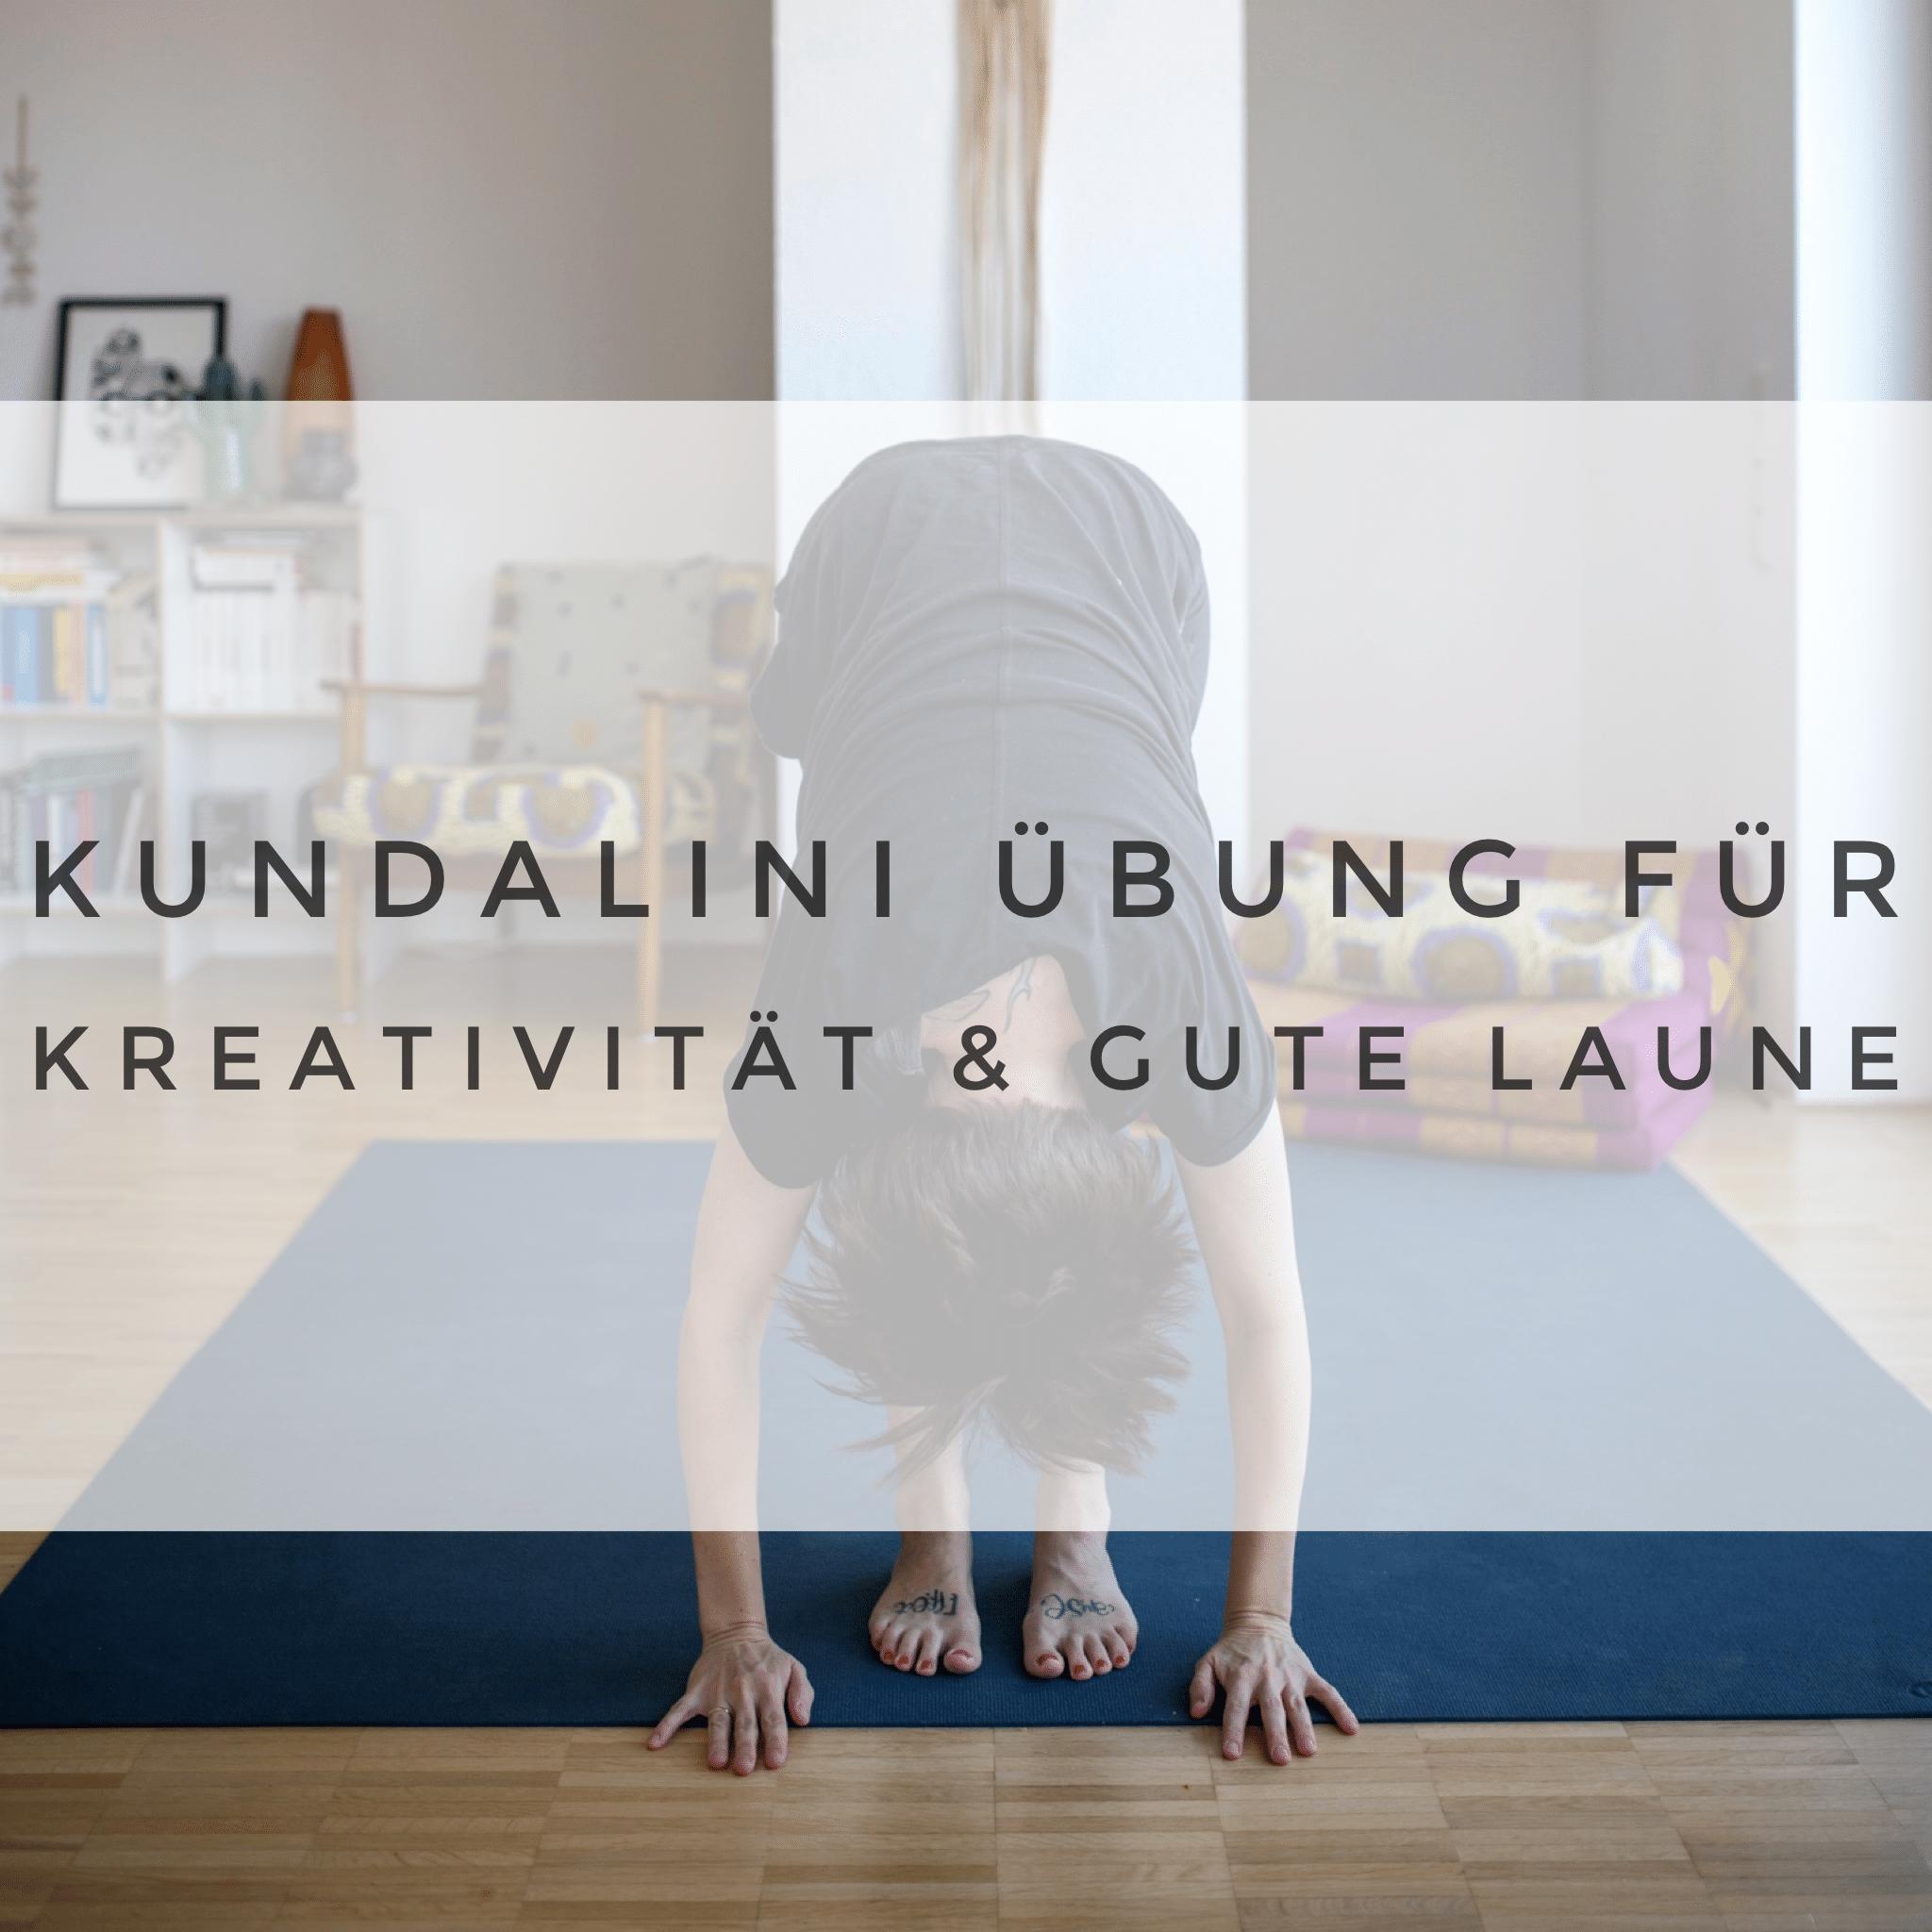 Kundalini Übung für Kreativität